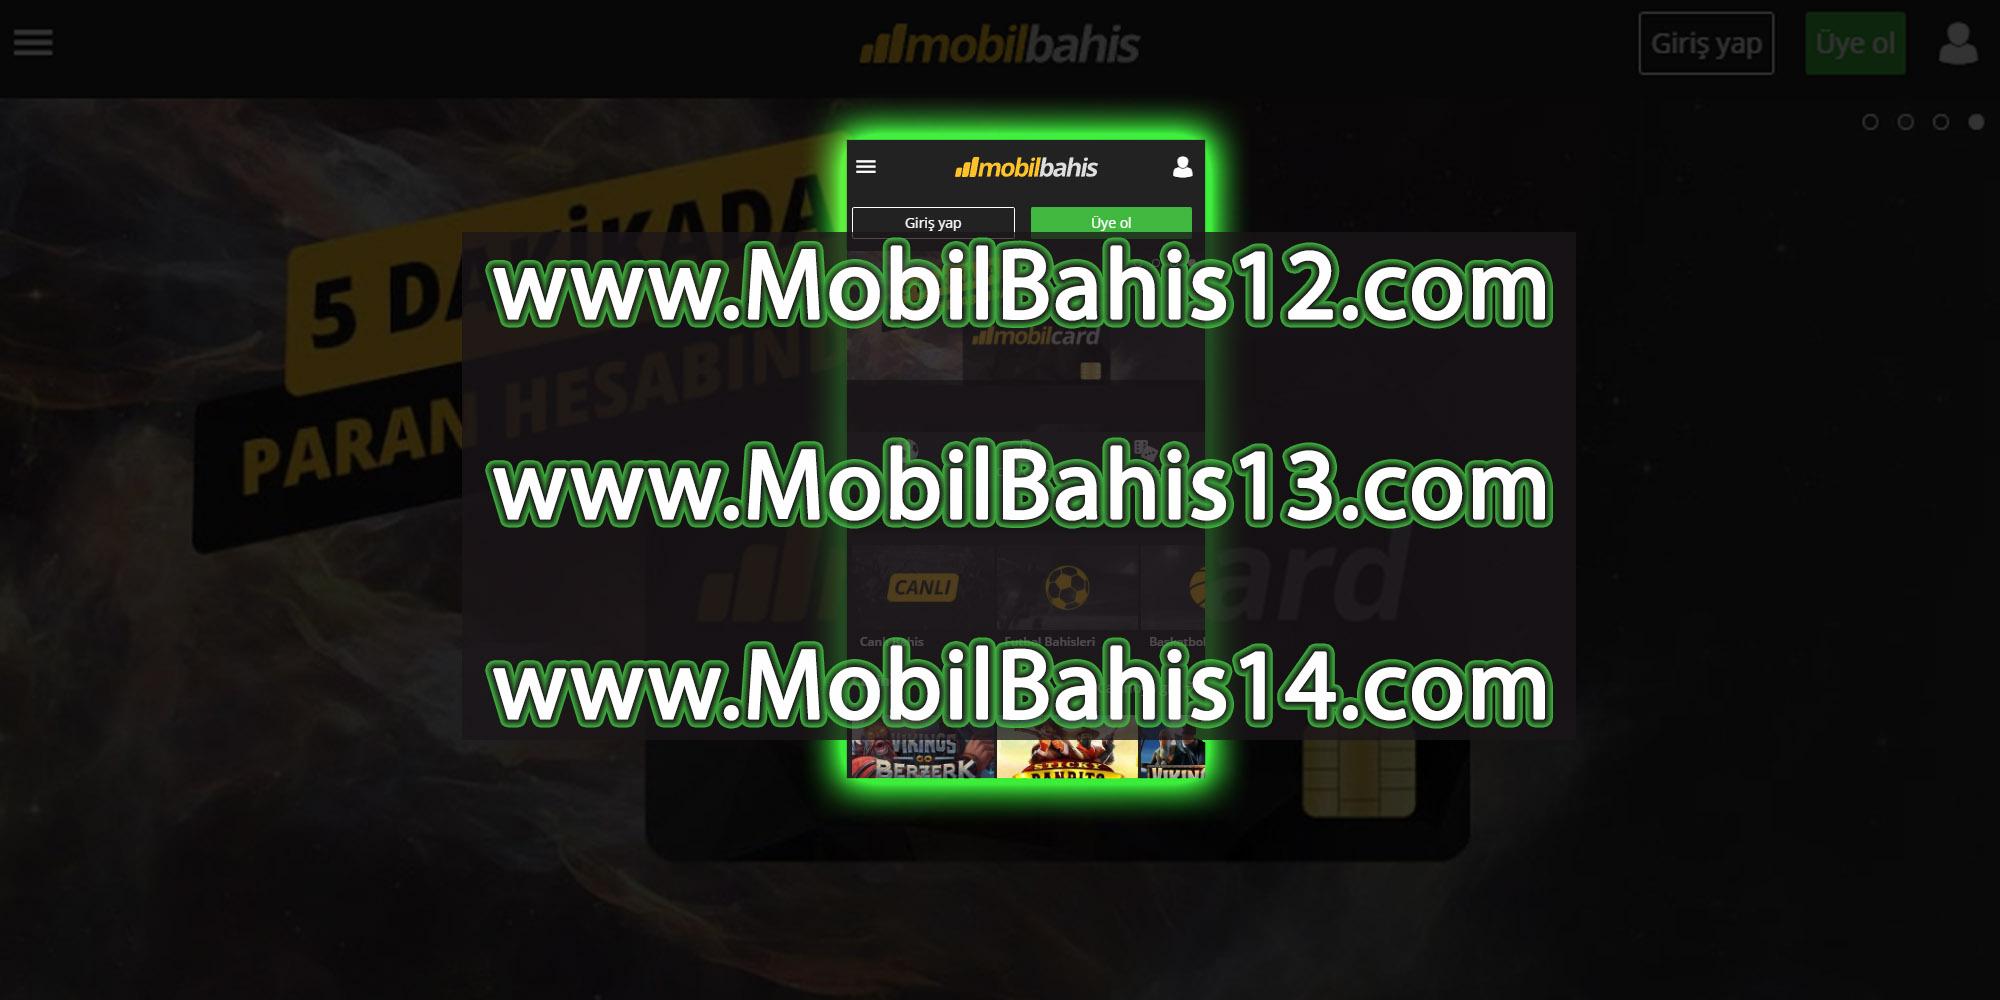 Mobilbahis 12 - Mobilbahis 13 - Mobilbahis 14